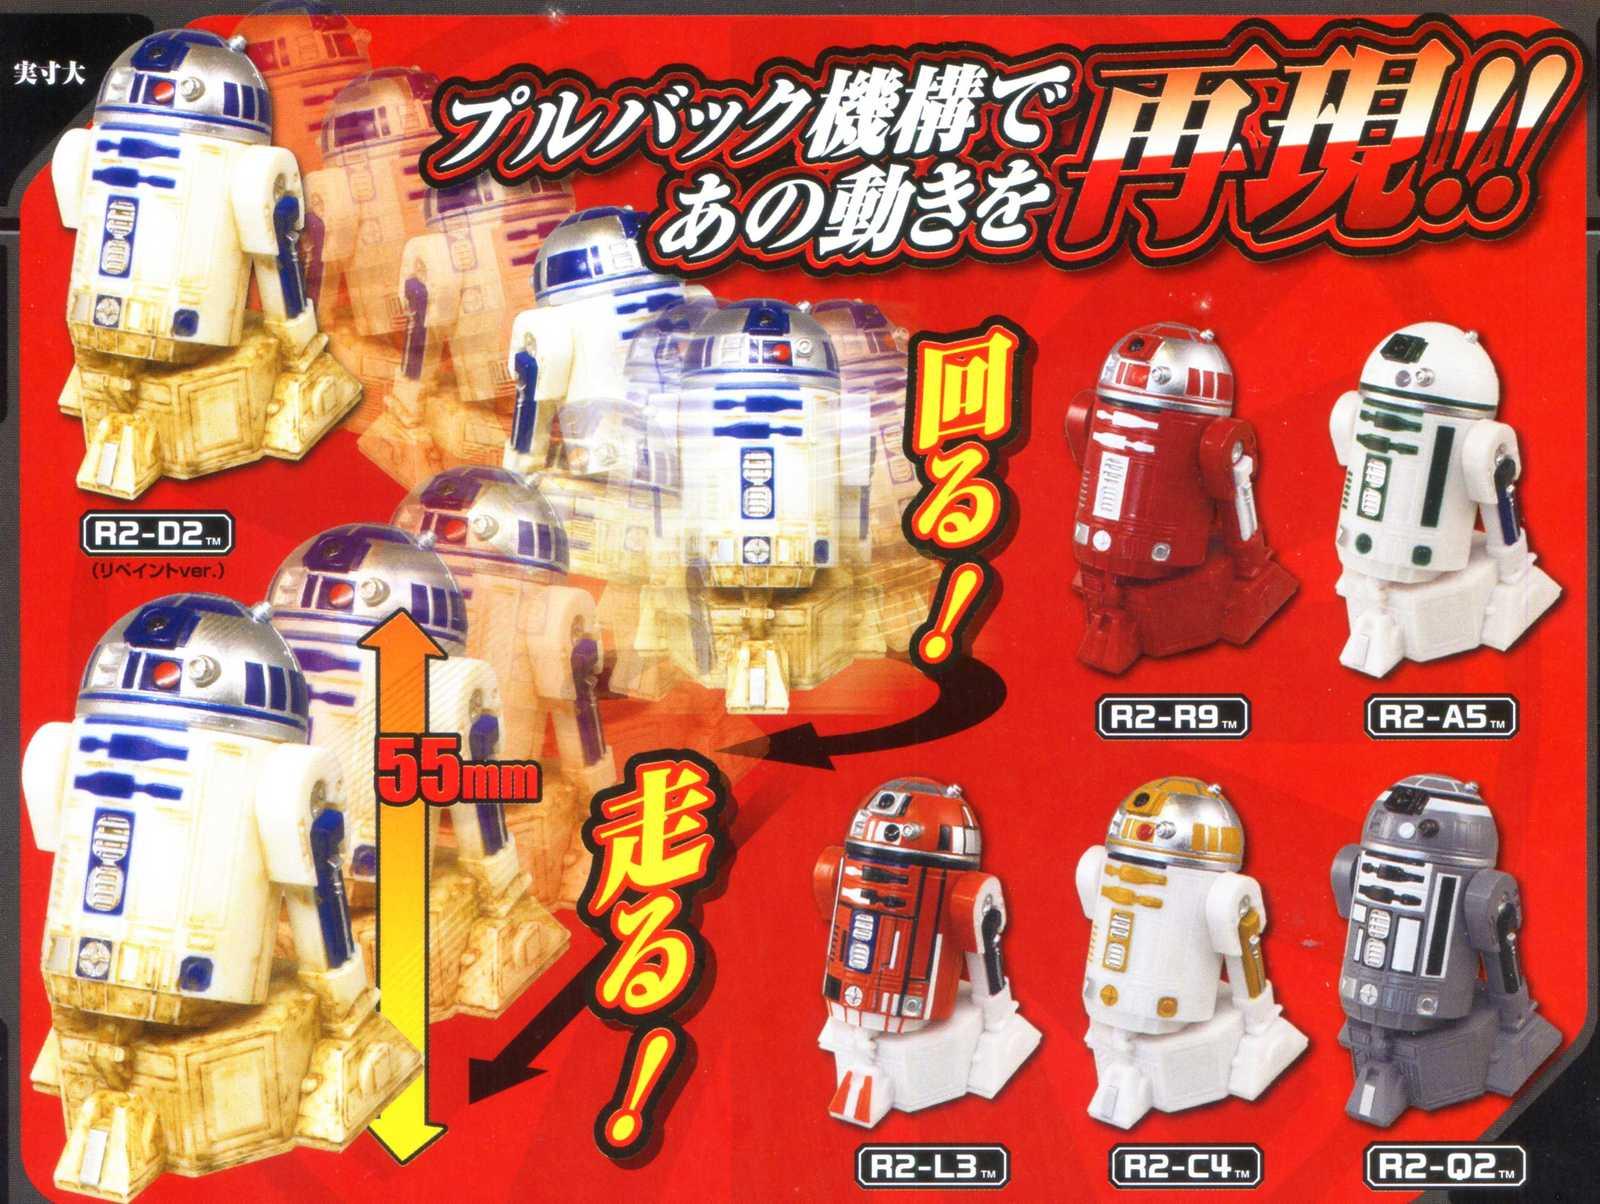 TAKARA TOMY ARTS STAR WARS Characters GACHA GALAXY PULLBACK DROID Phase 2 R2-A5